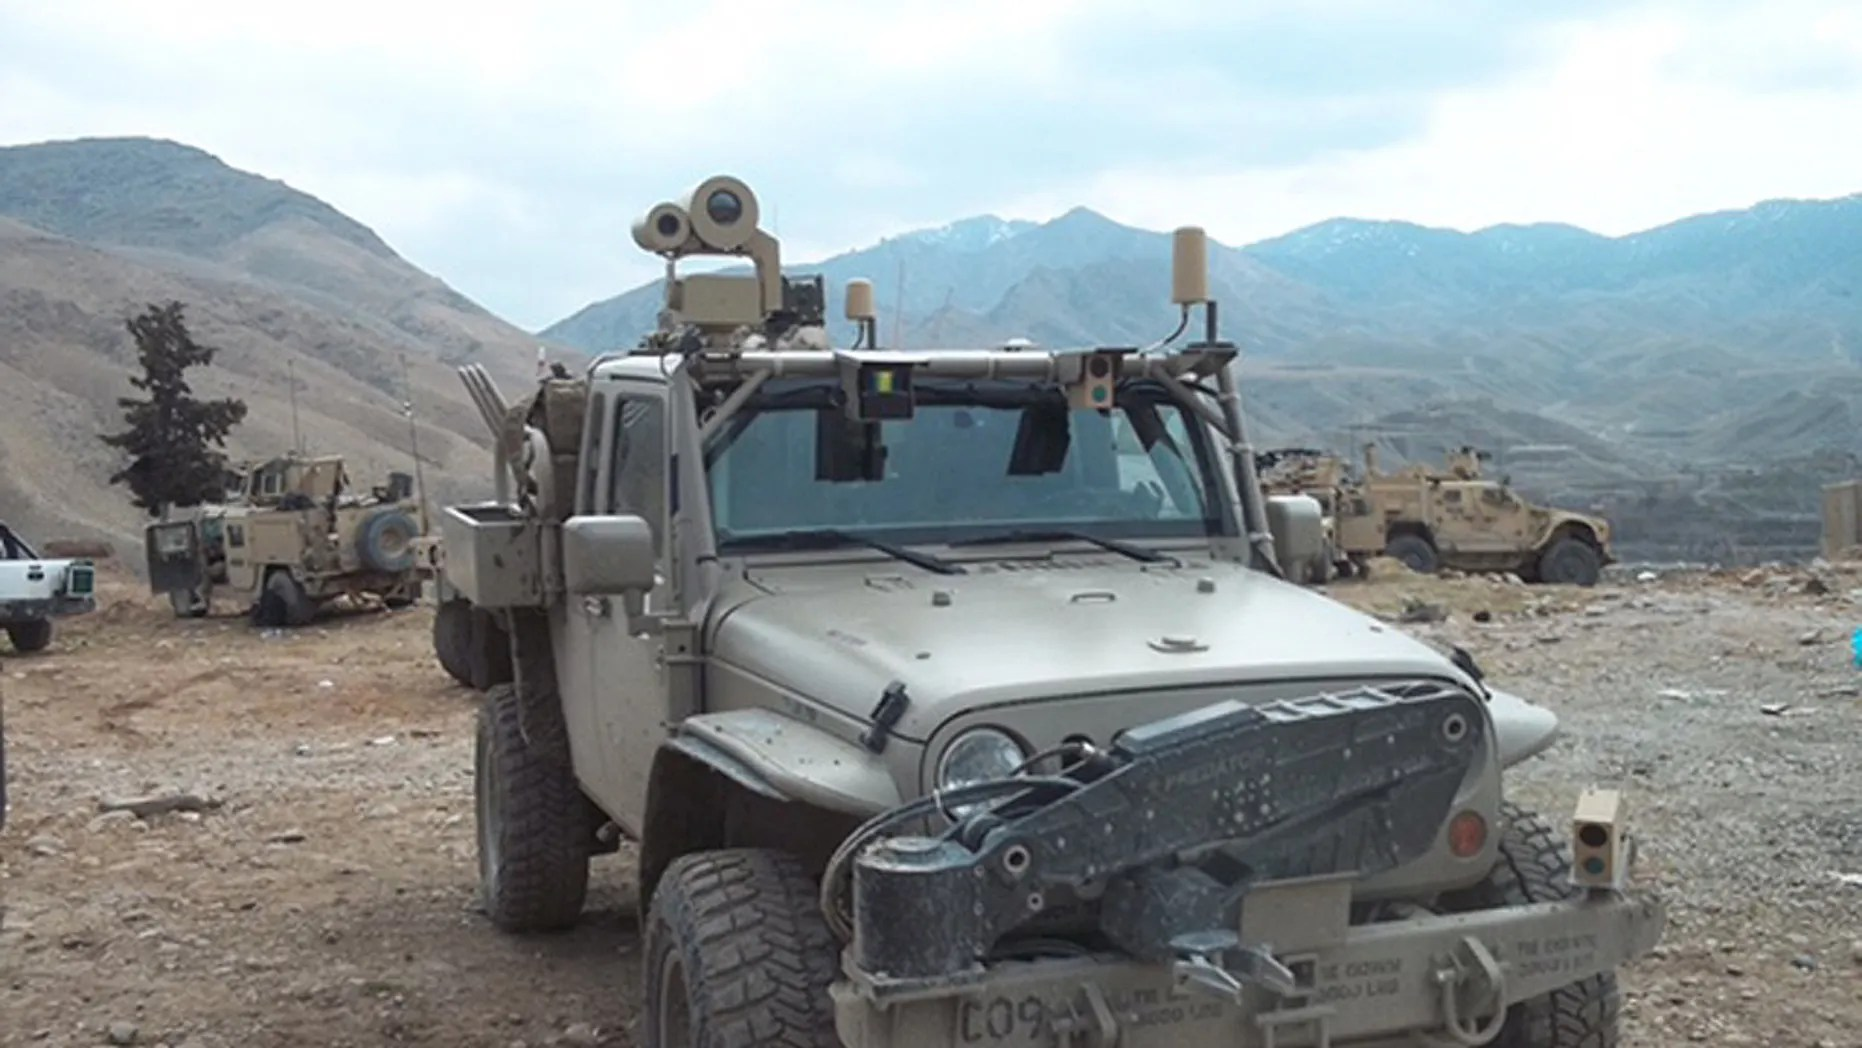 commando jeep photo hendrick dynamics  [ 1862 x 1048 Pixel ]